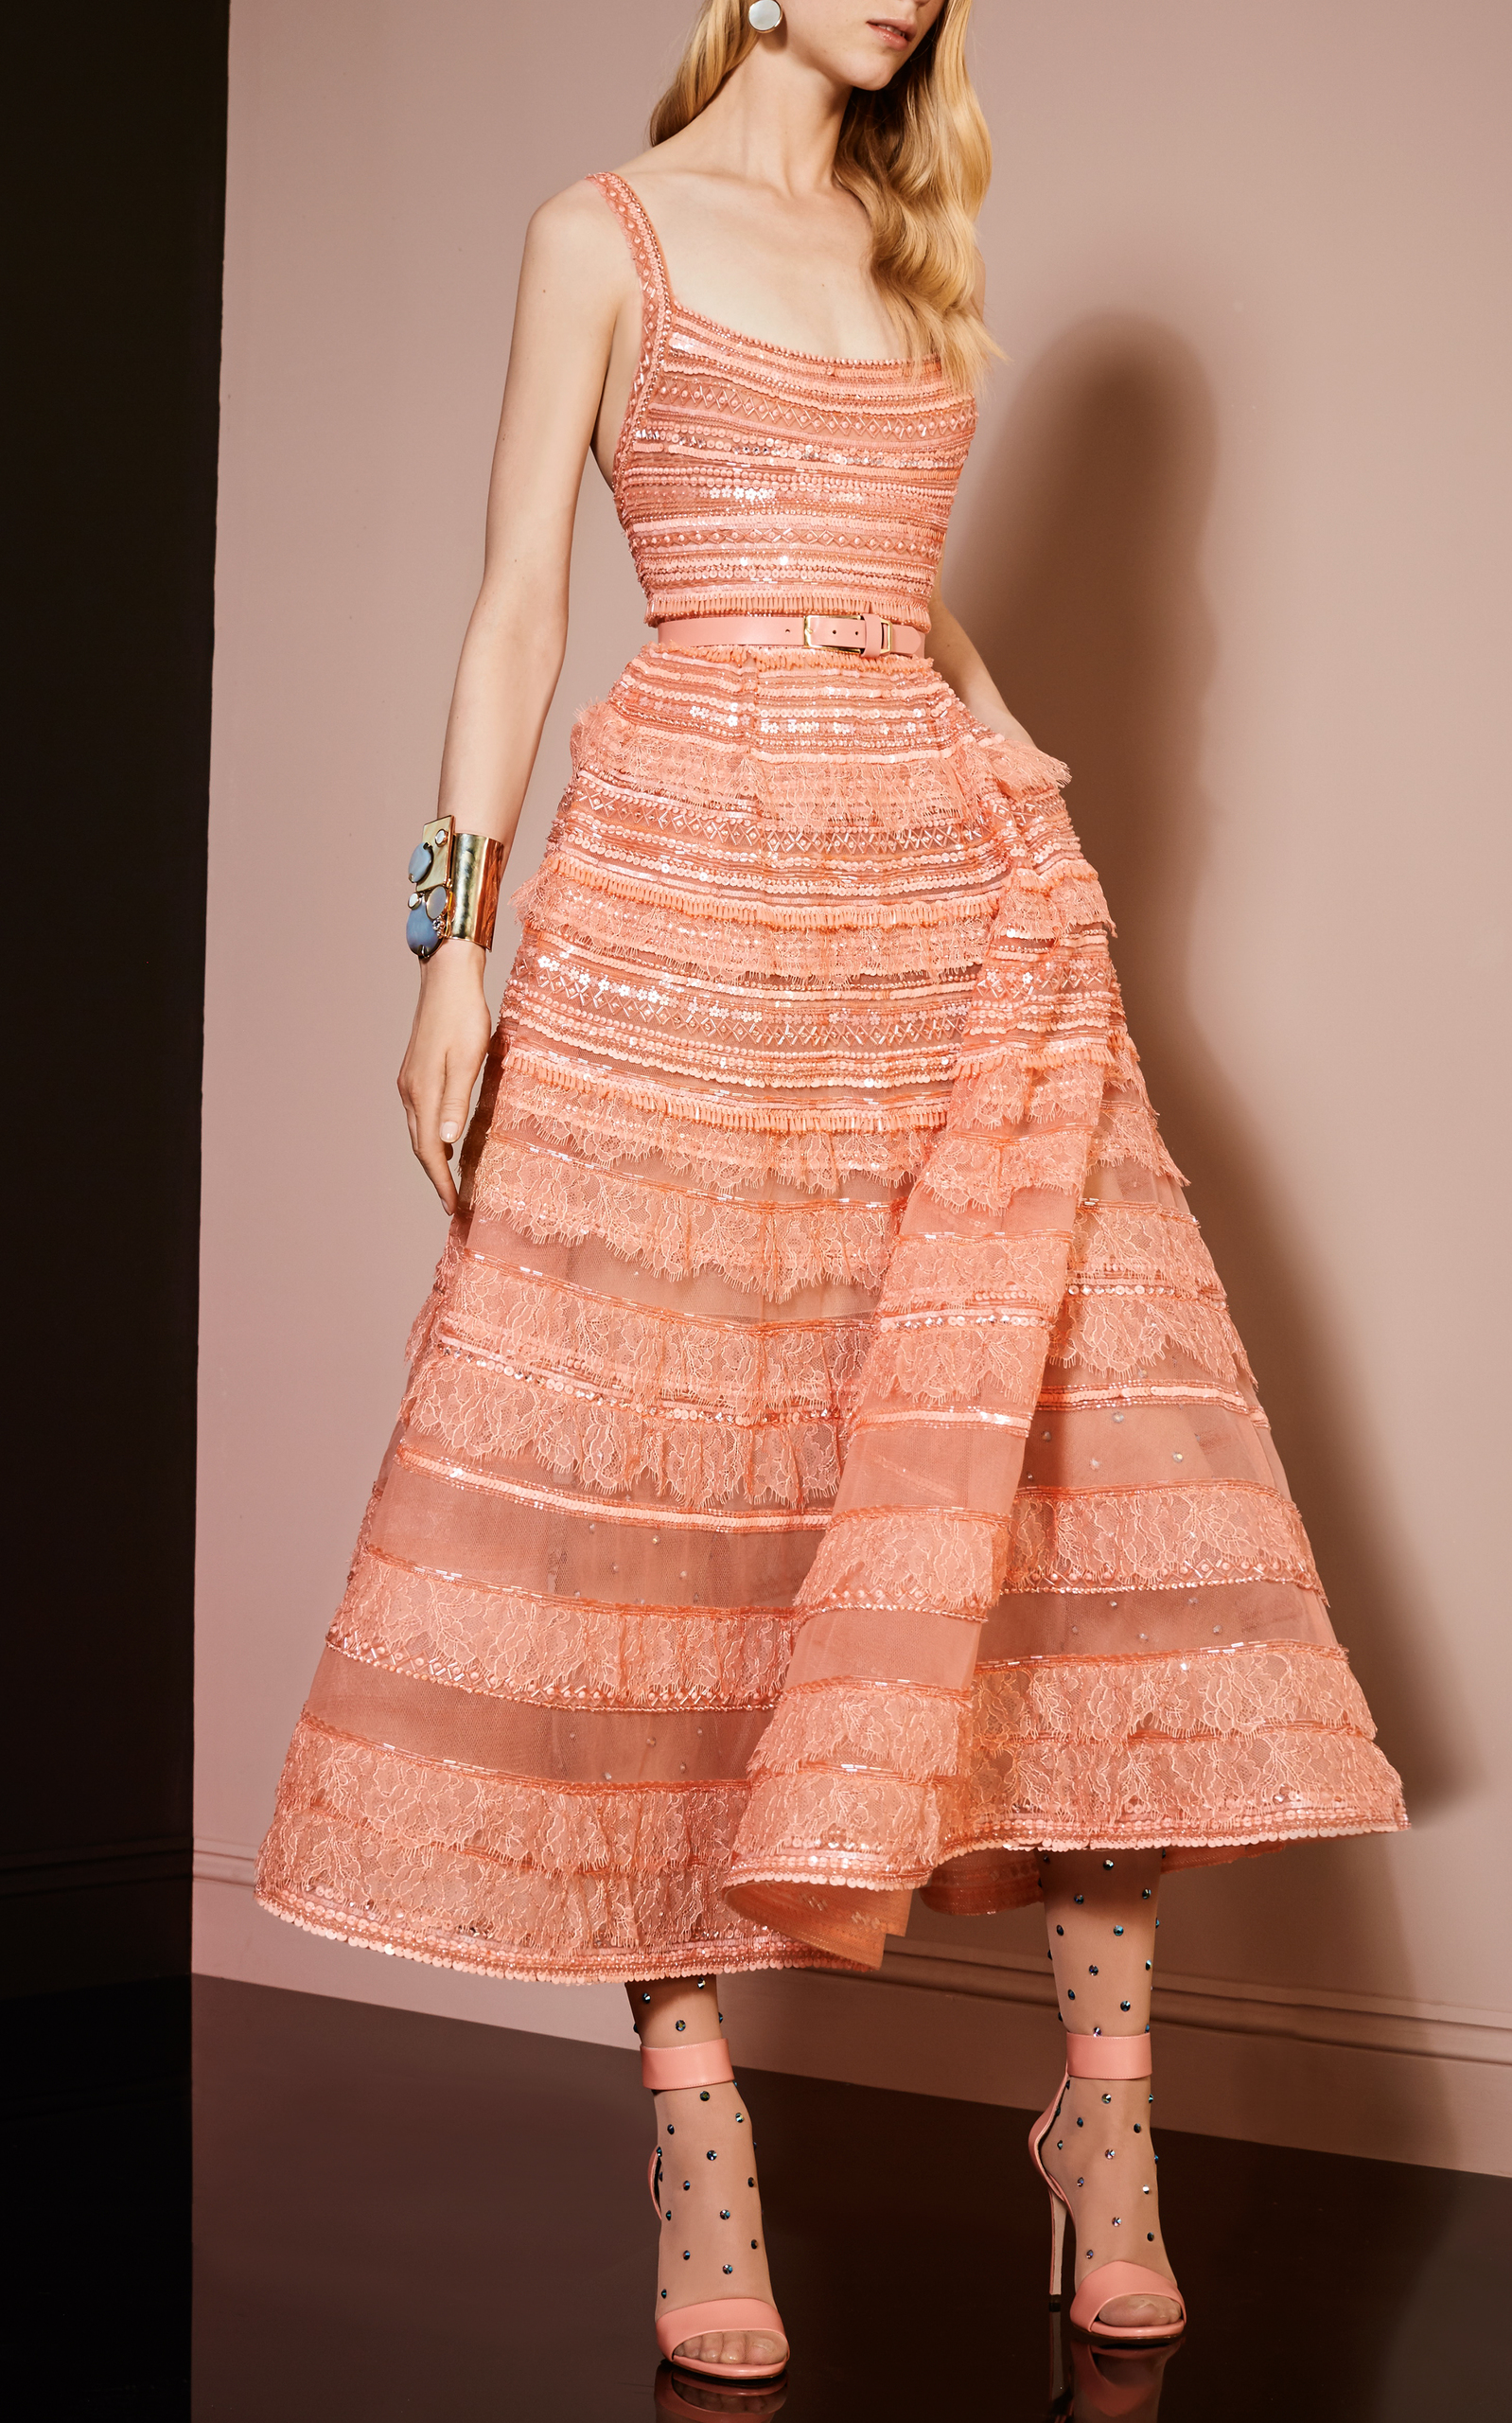 Ankle Length Dresses at Marshalls